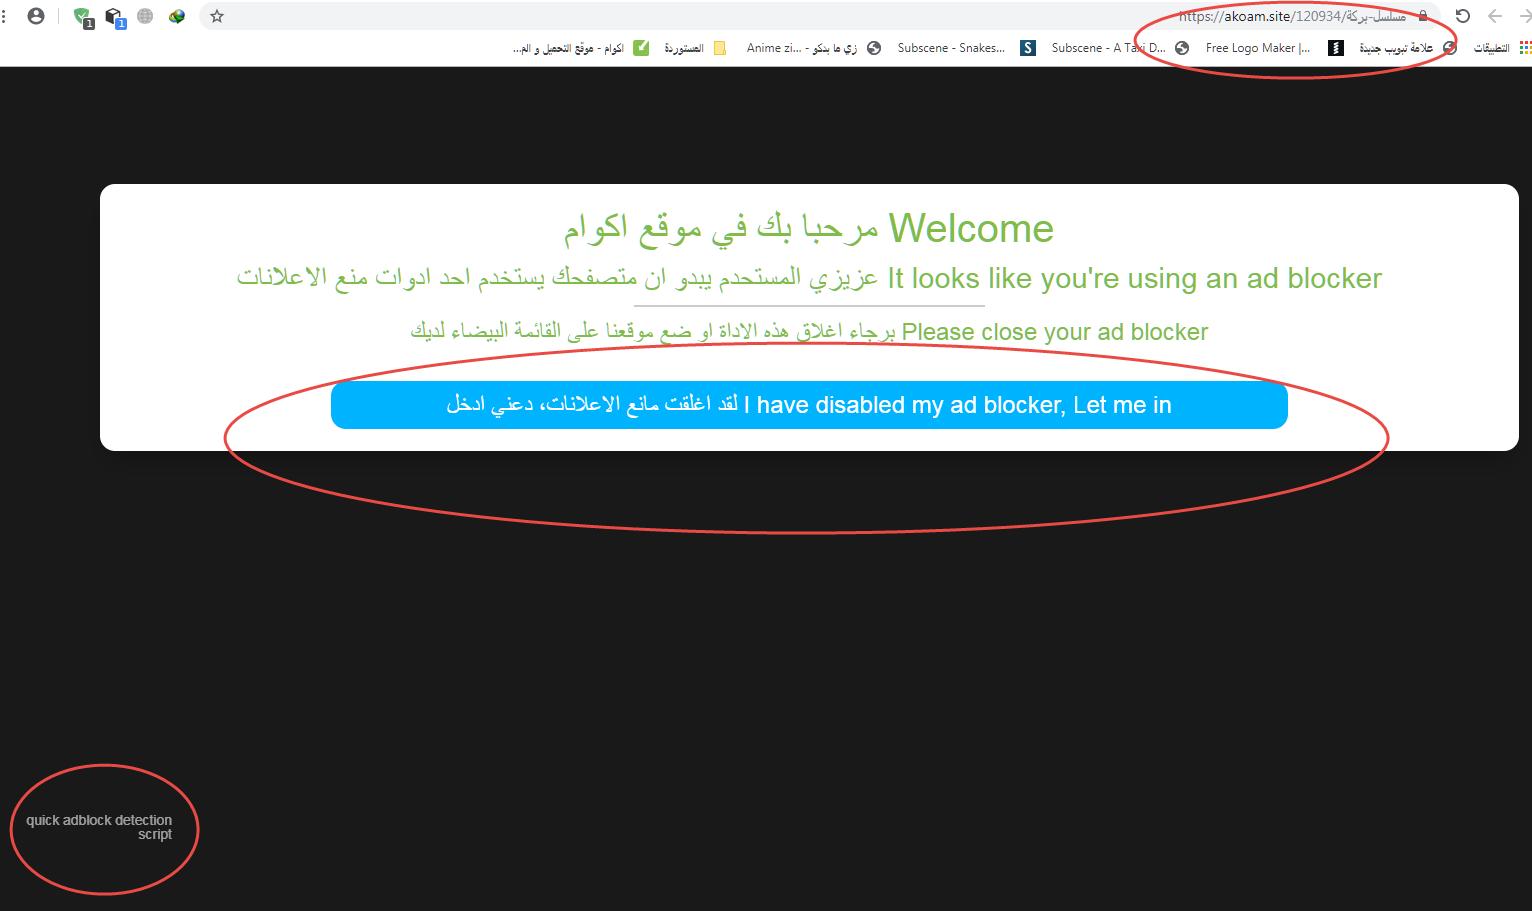 akoam site · Issue #34484 · AdguardTeam/AdguardFilters · GitHub